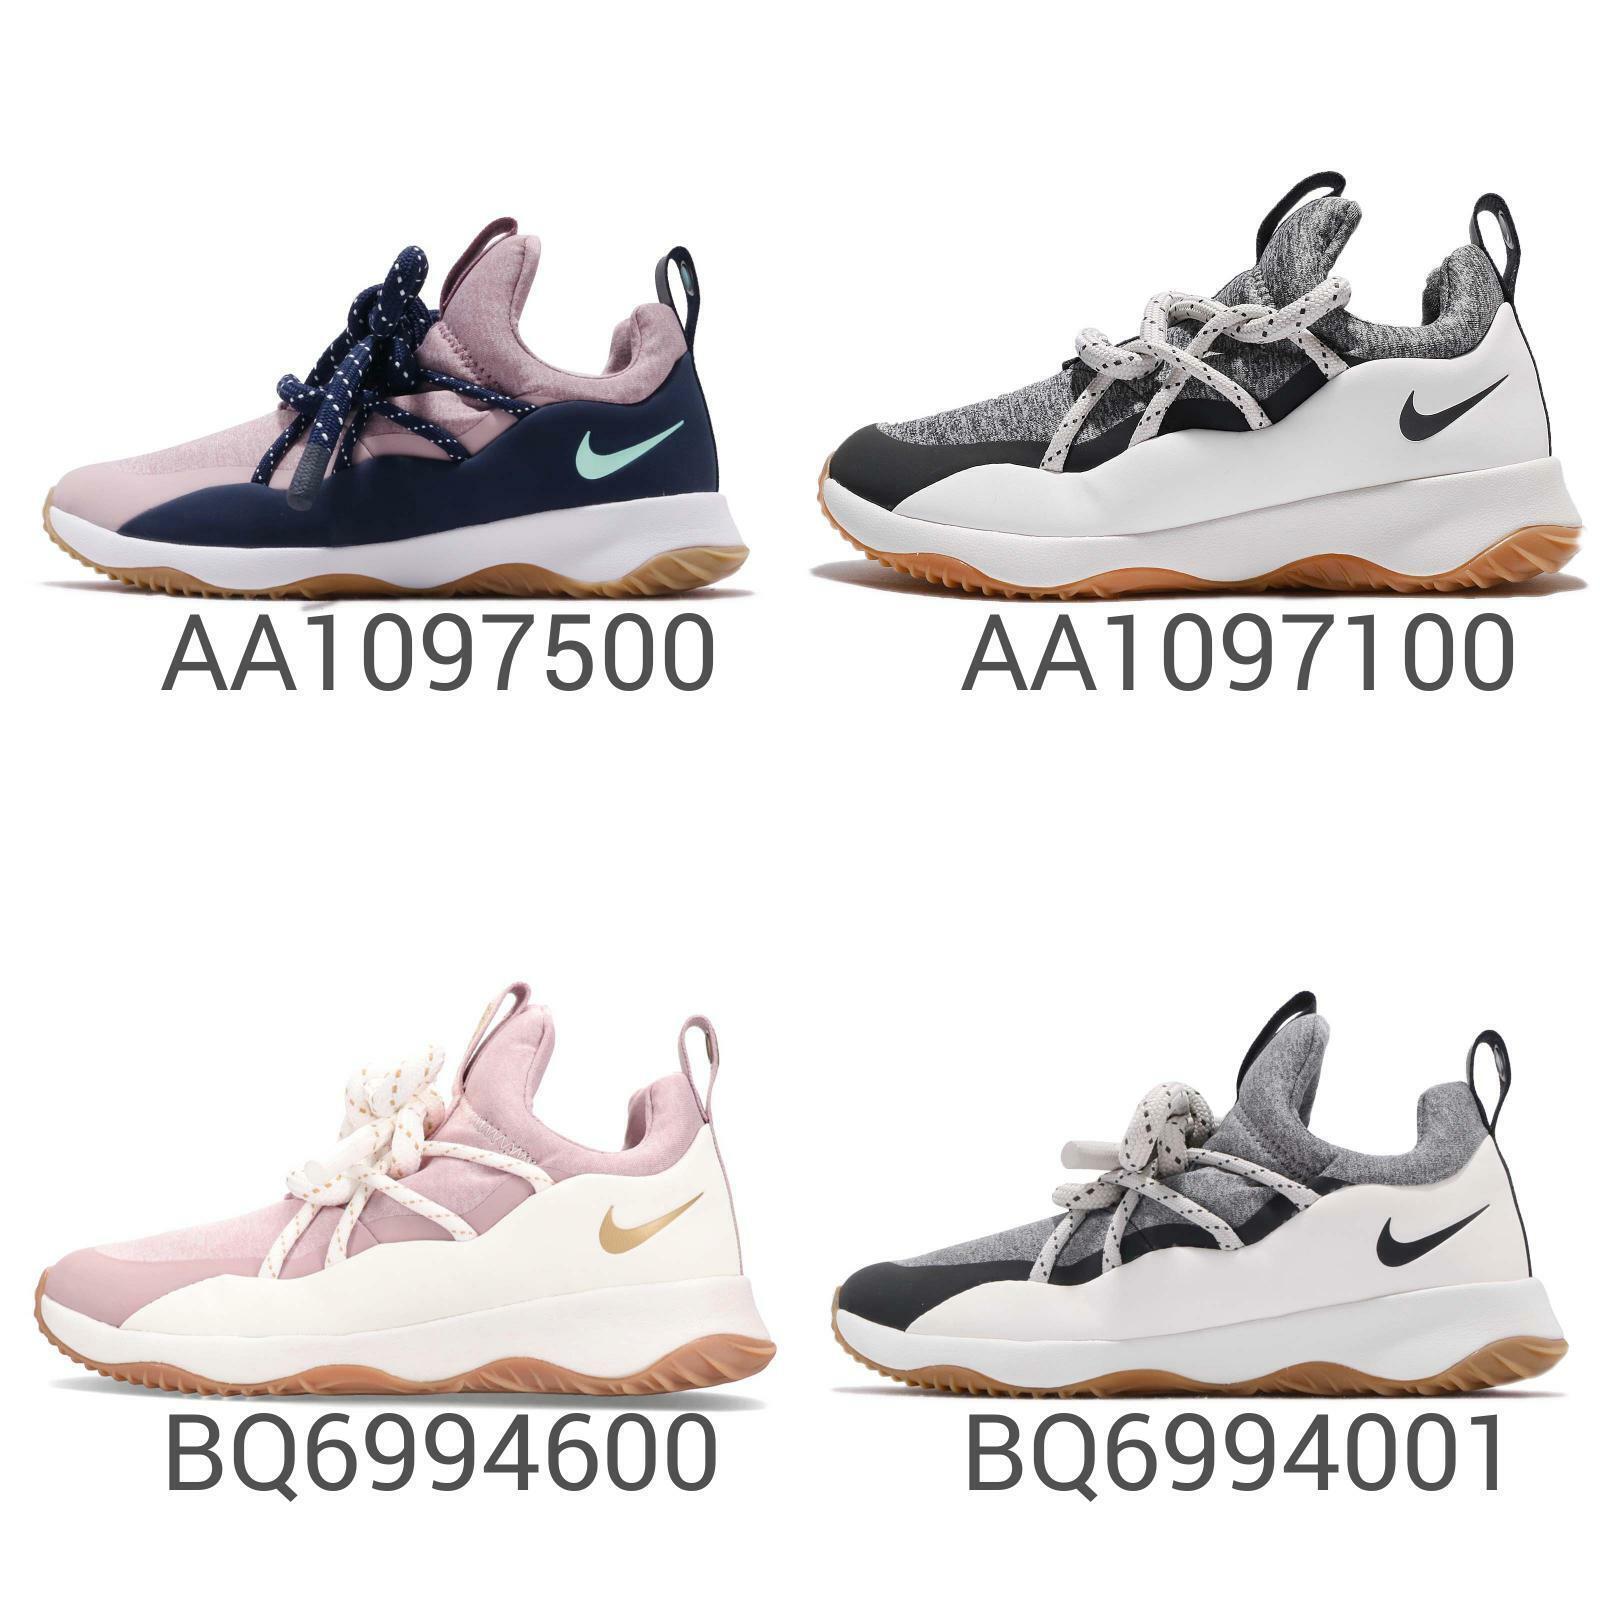 Wmns Nike City Loop Women Running shoes Sneaker Trainers Pick 1